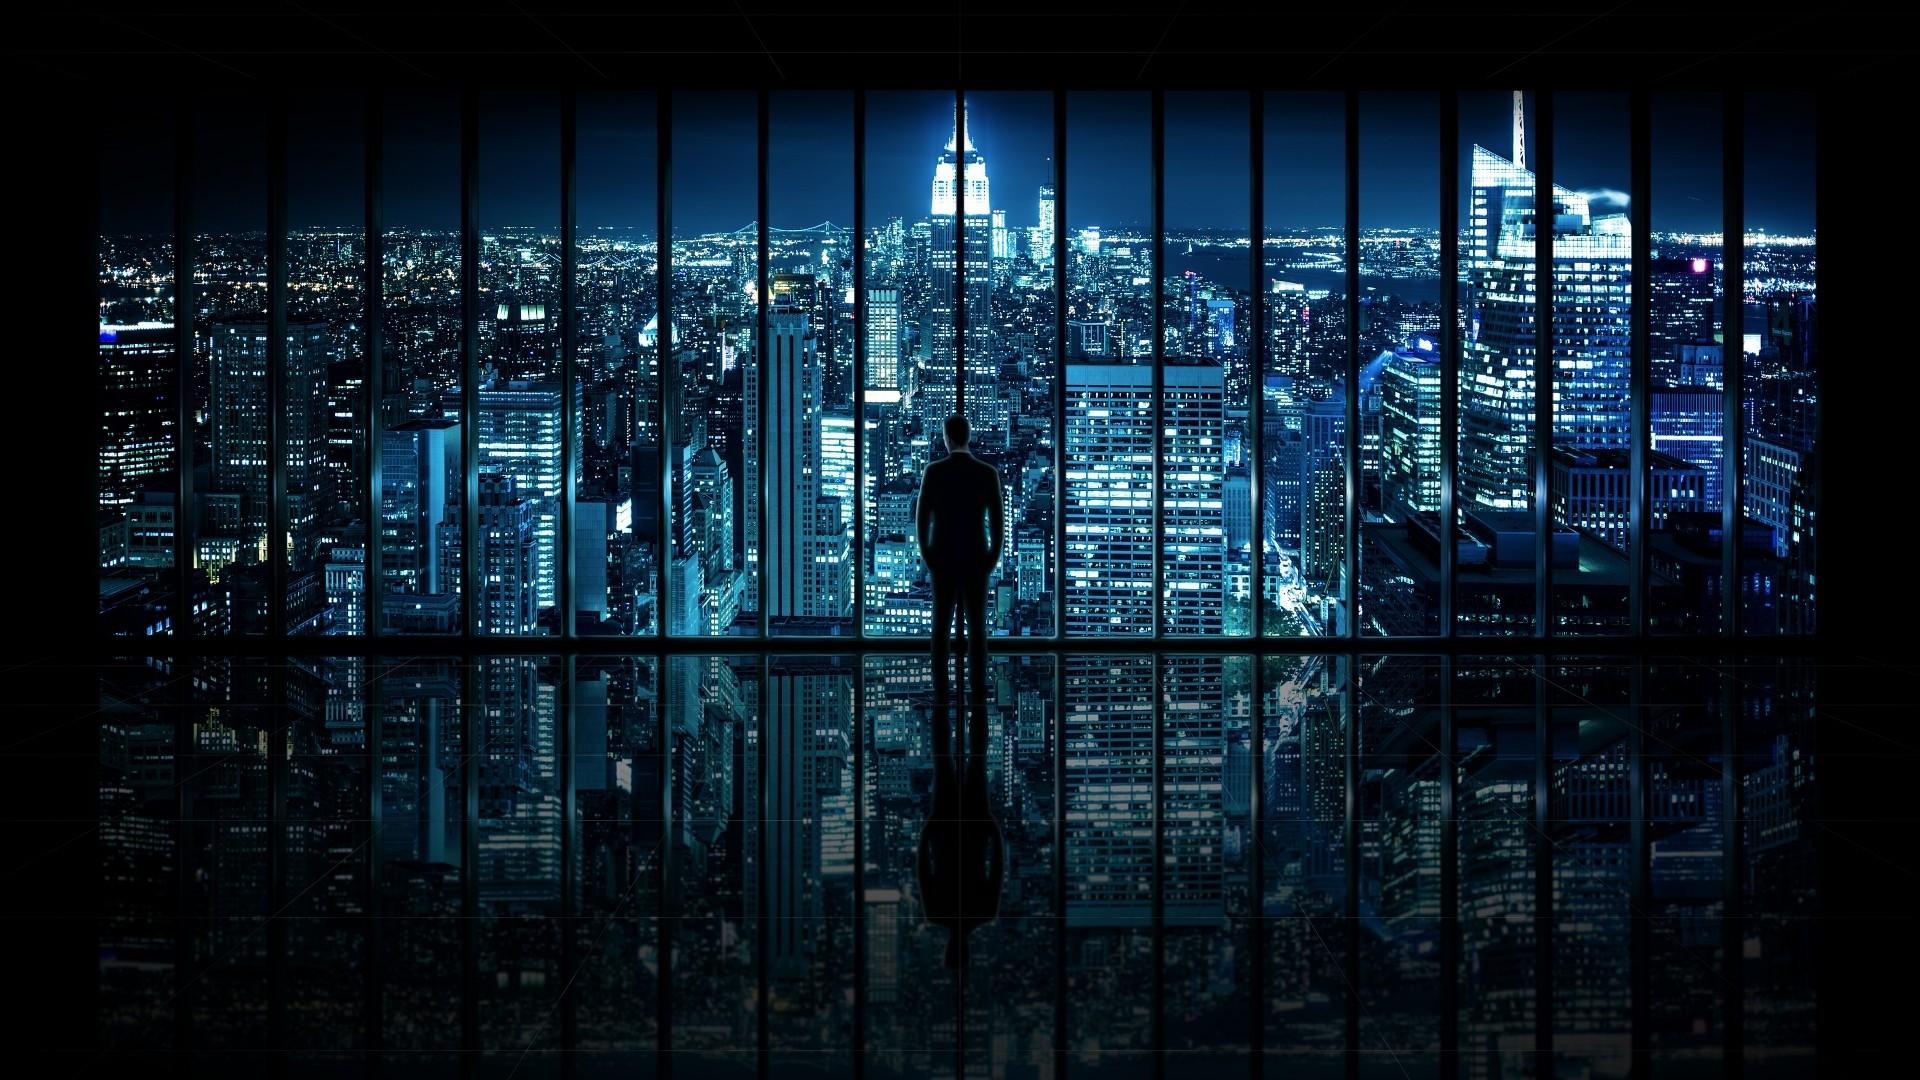 Dark City Wallpaper Image